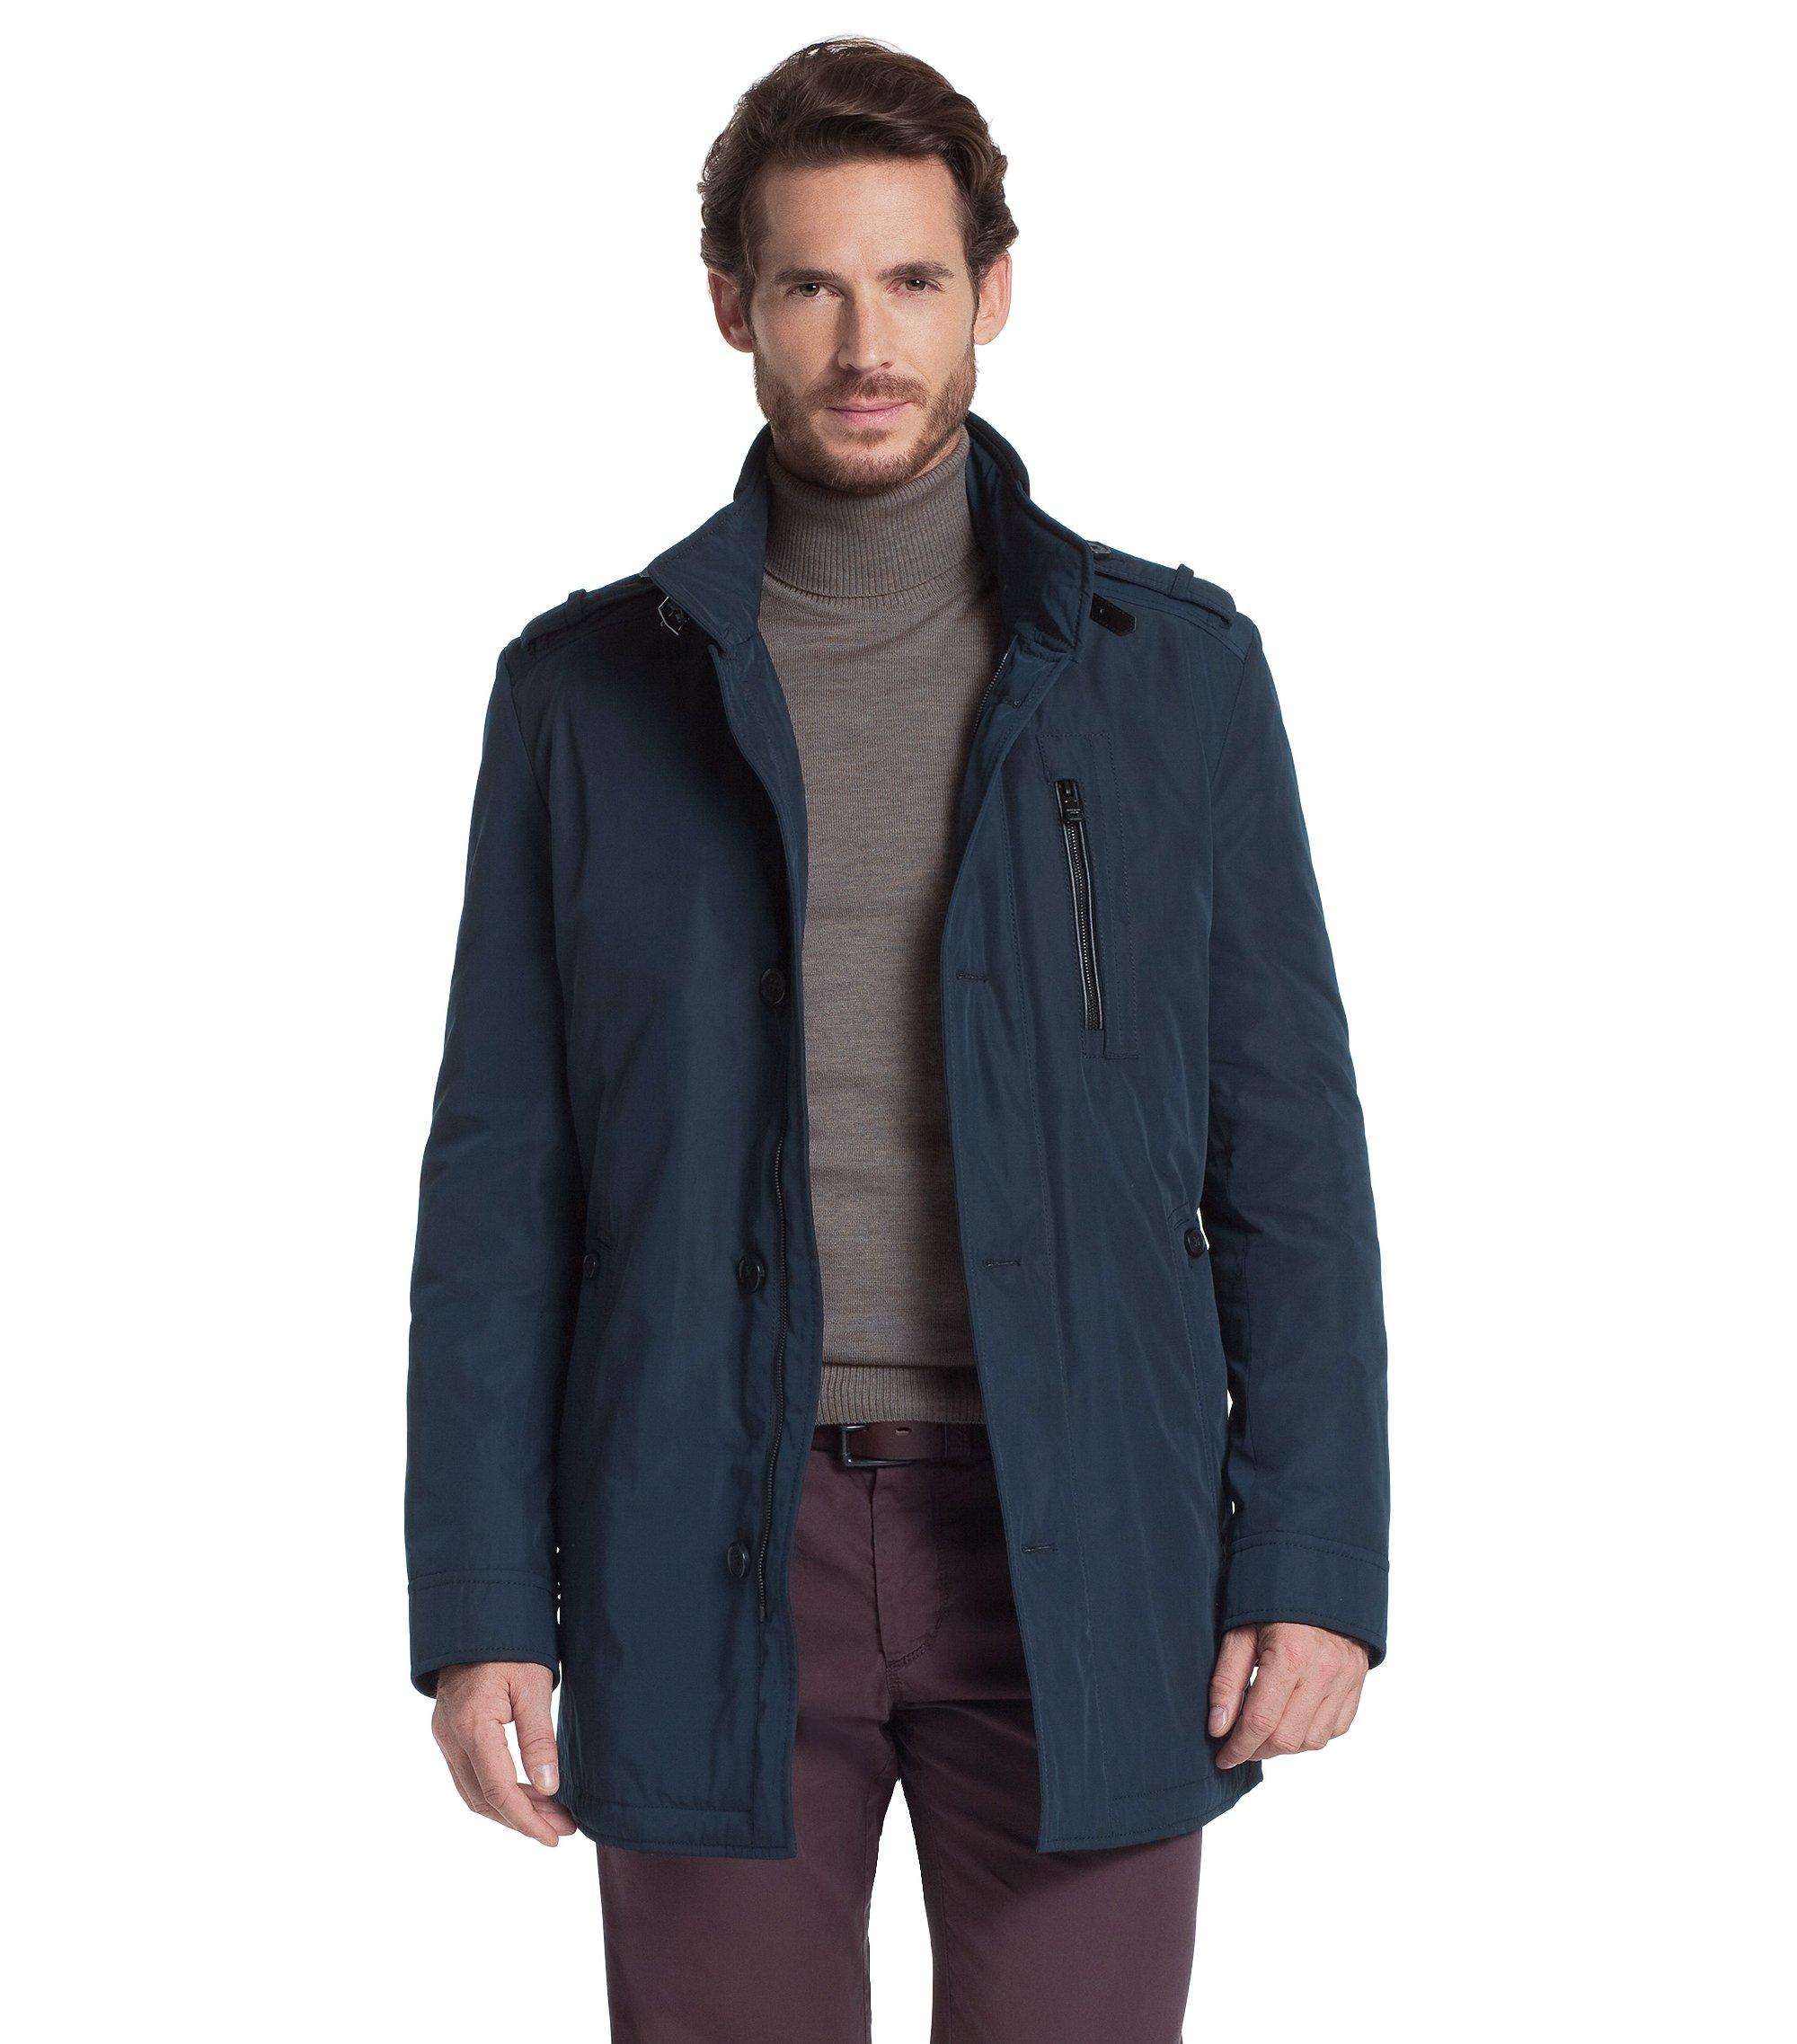 Outdoor-Jacke ´Conaz` aus Kunstfaser, Dunkelblau